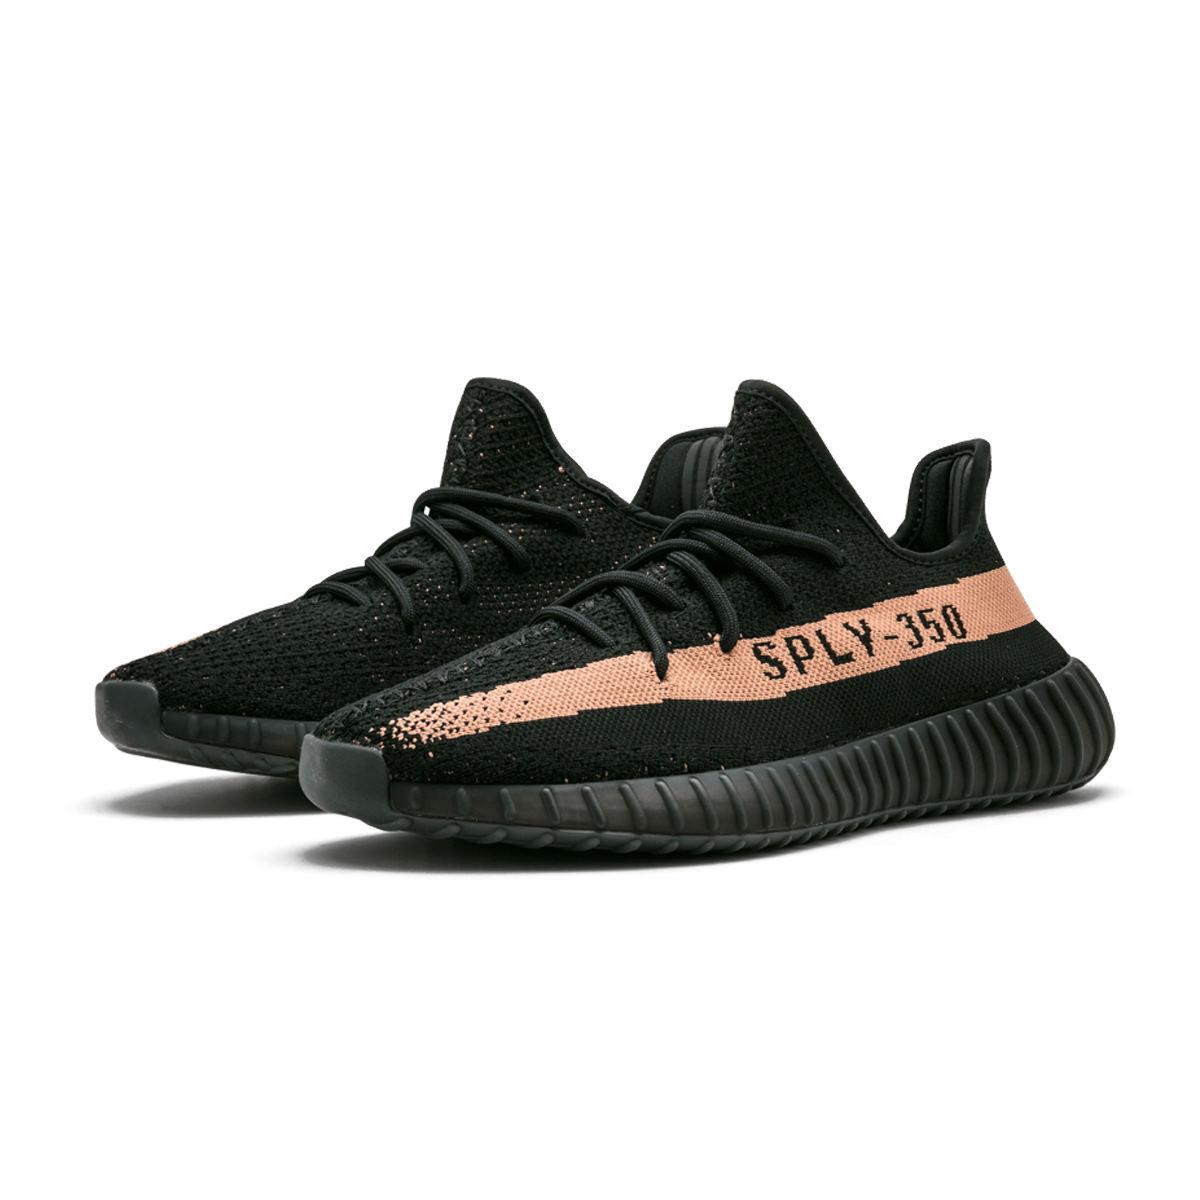 adidas Yeezy Boost 350 V2 Core Black Copper